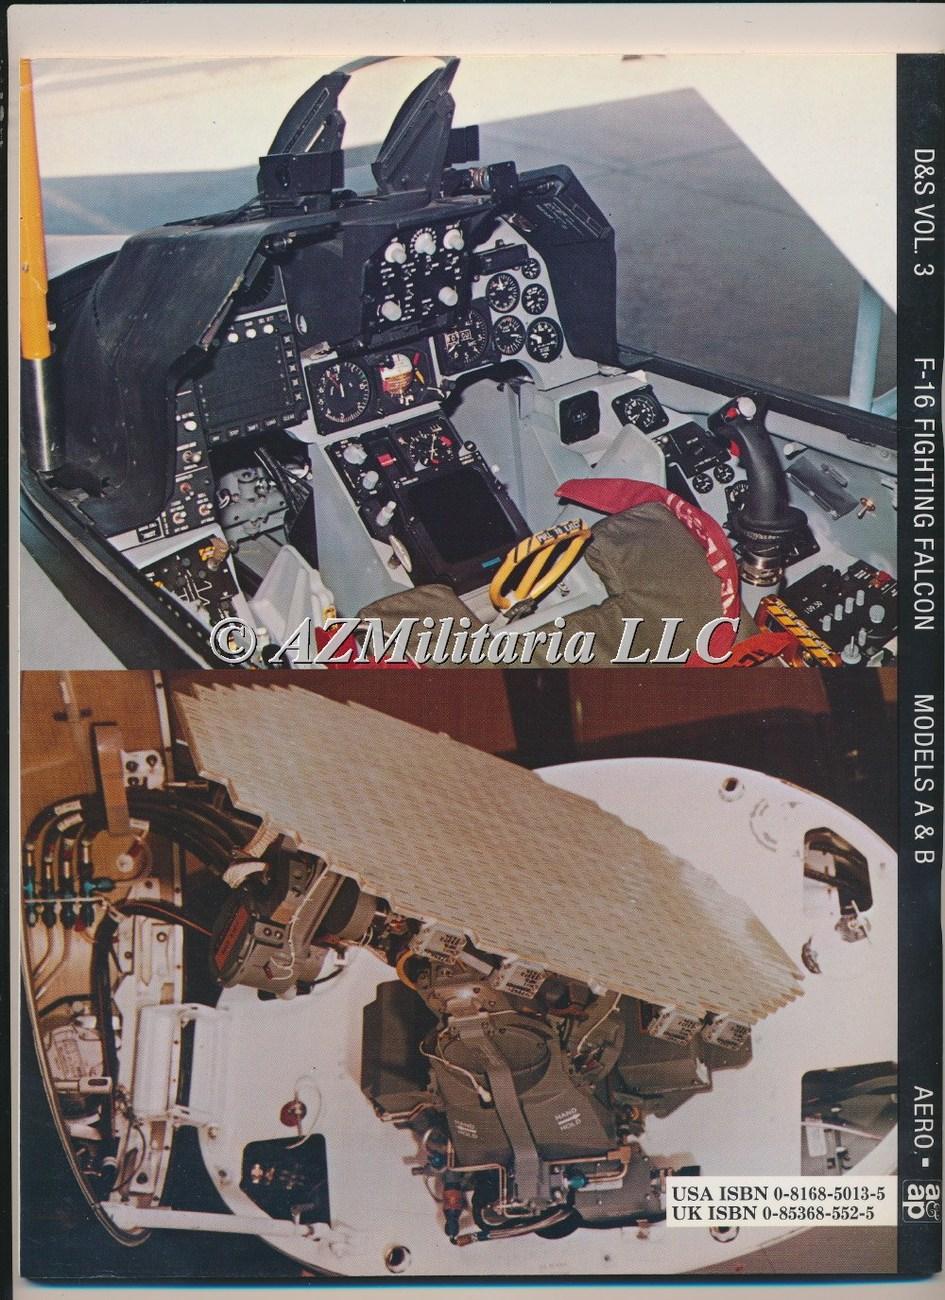 F-16 Fighting Falcon Models A & B D&S VOL 3